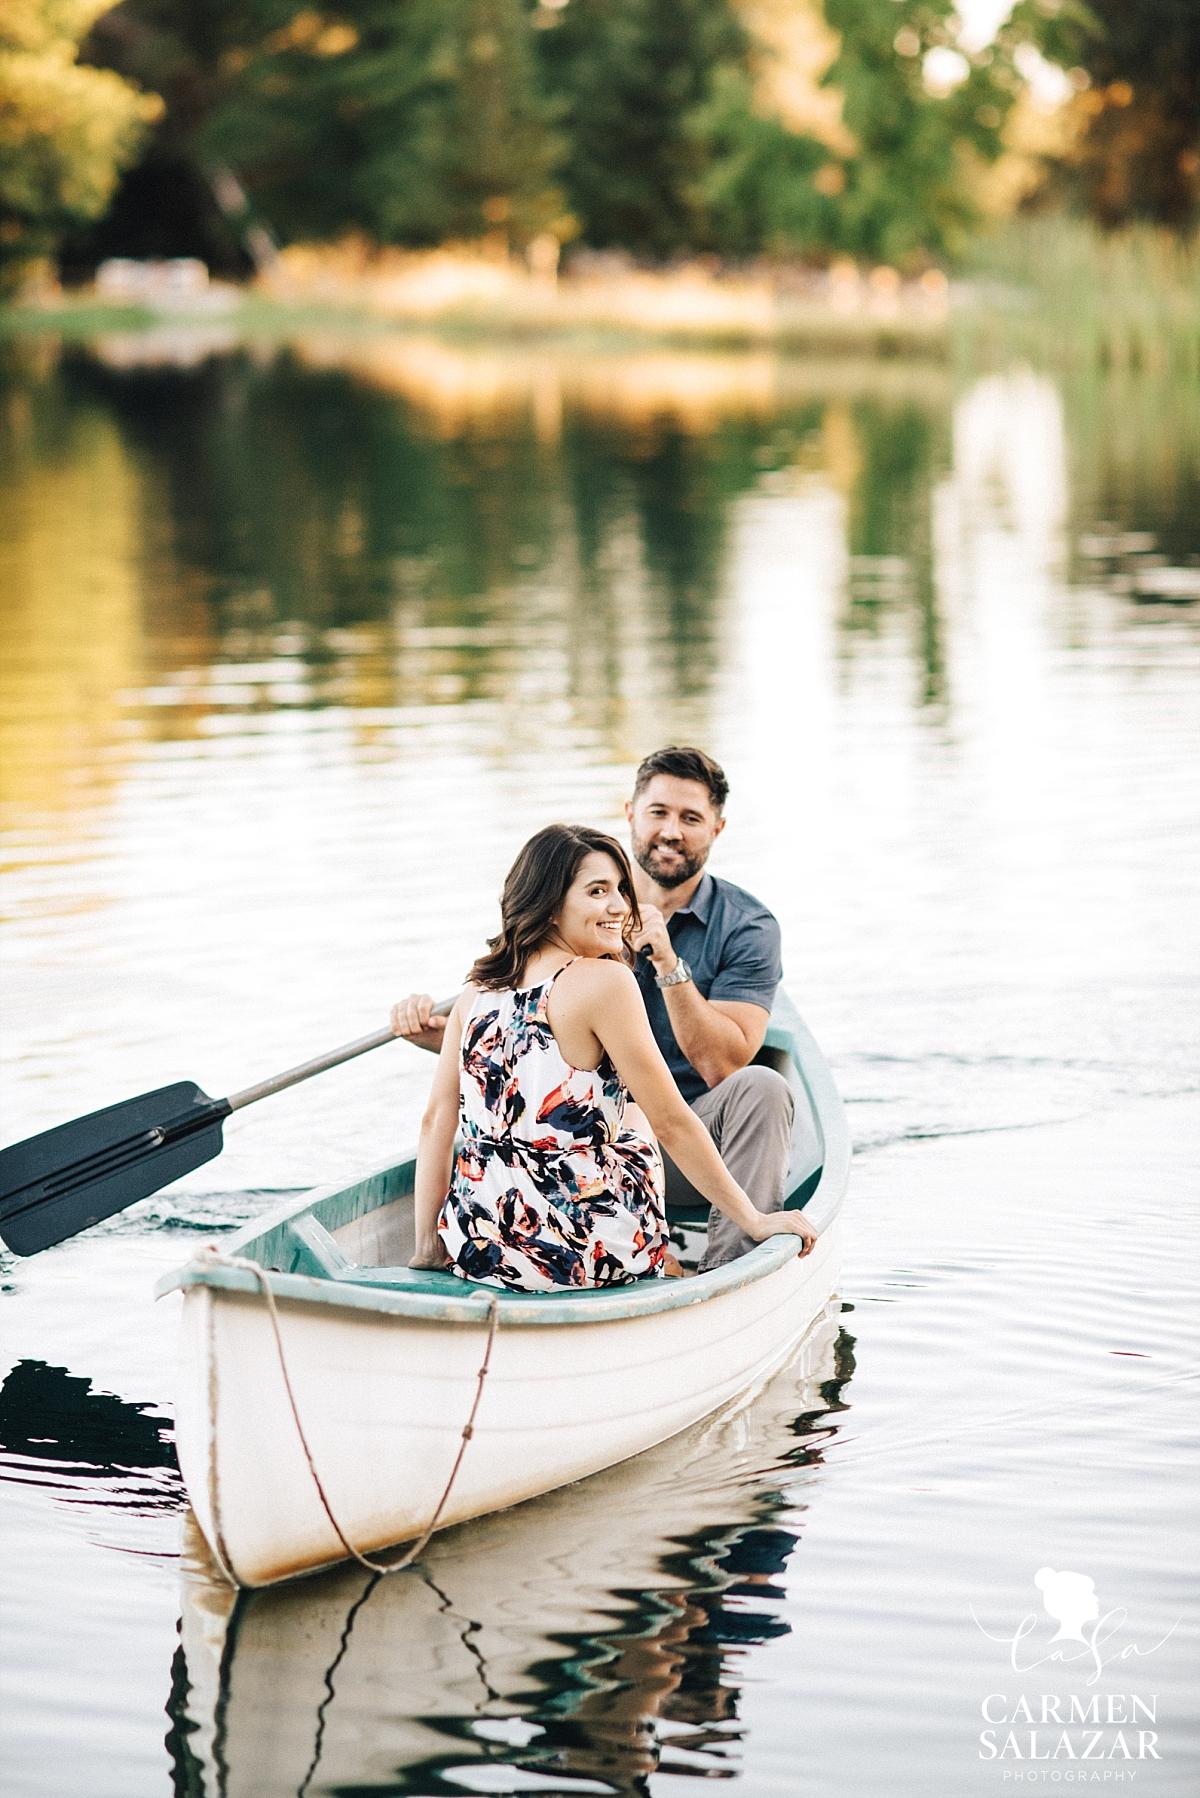 Boat themed engagement session - Carmen Salazar